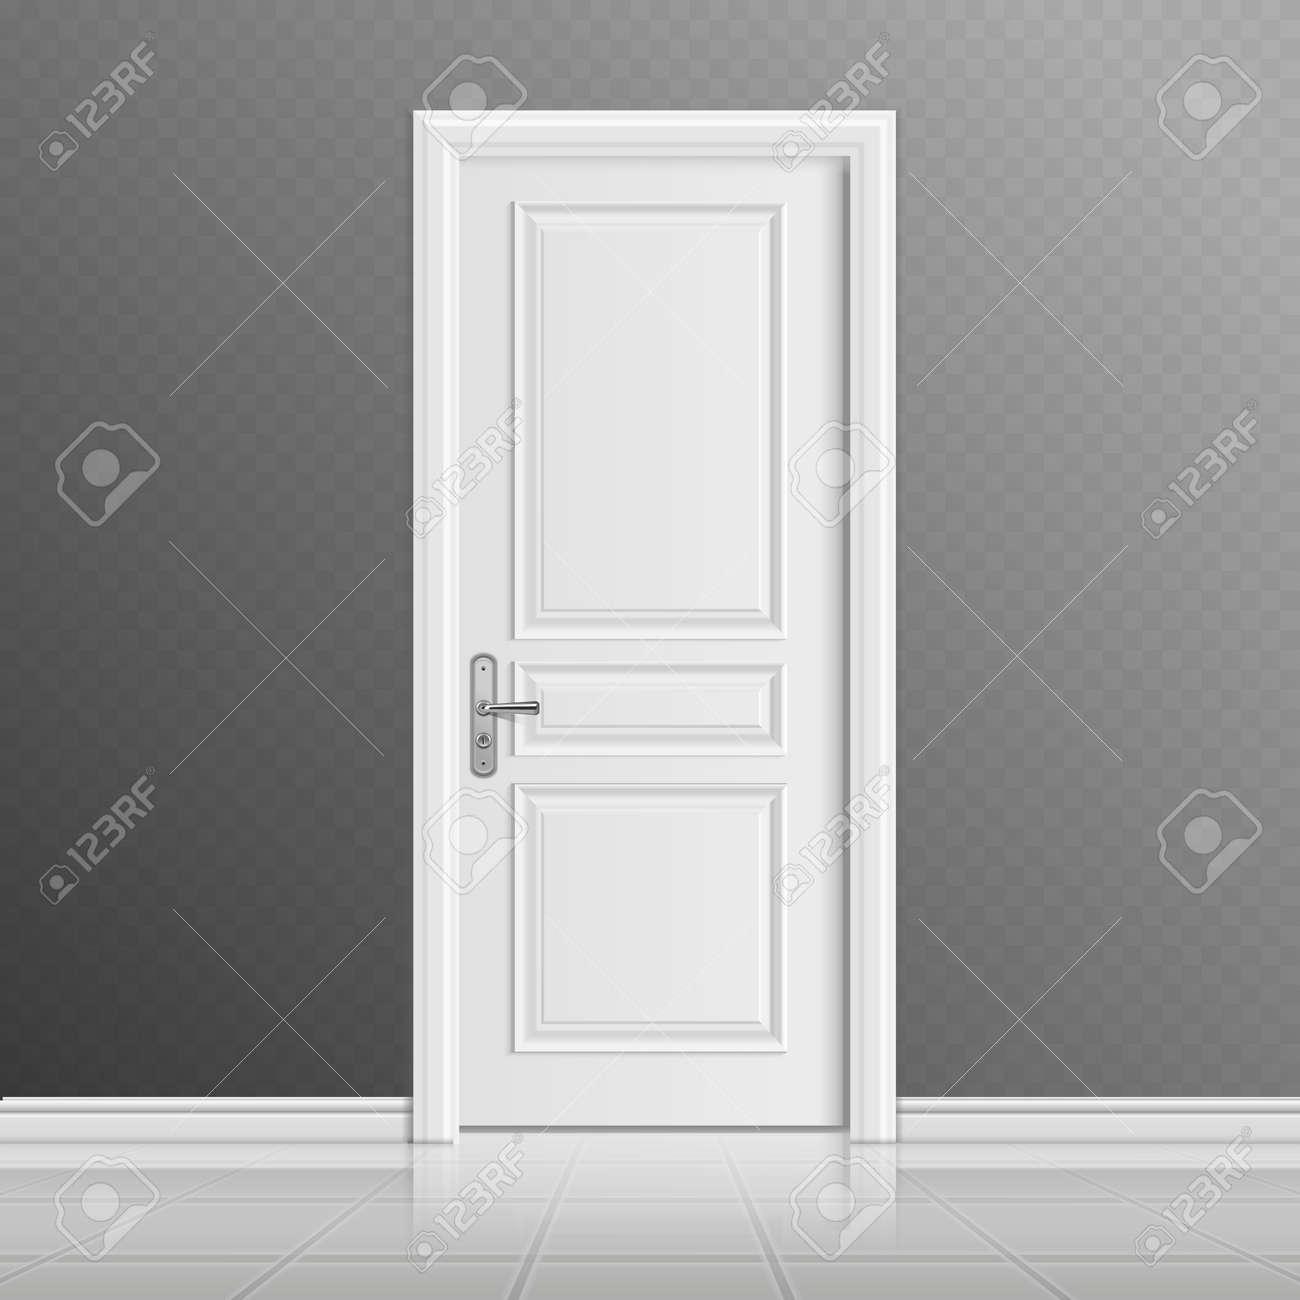 Closed white entrance door vector illustration. Doorway entrance in house, interior door illustration - 165951238